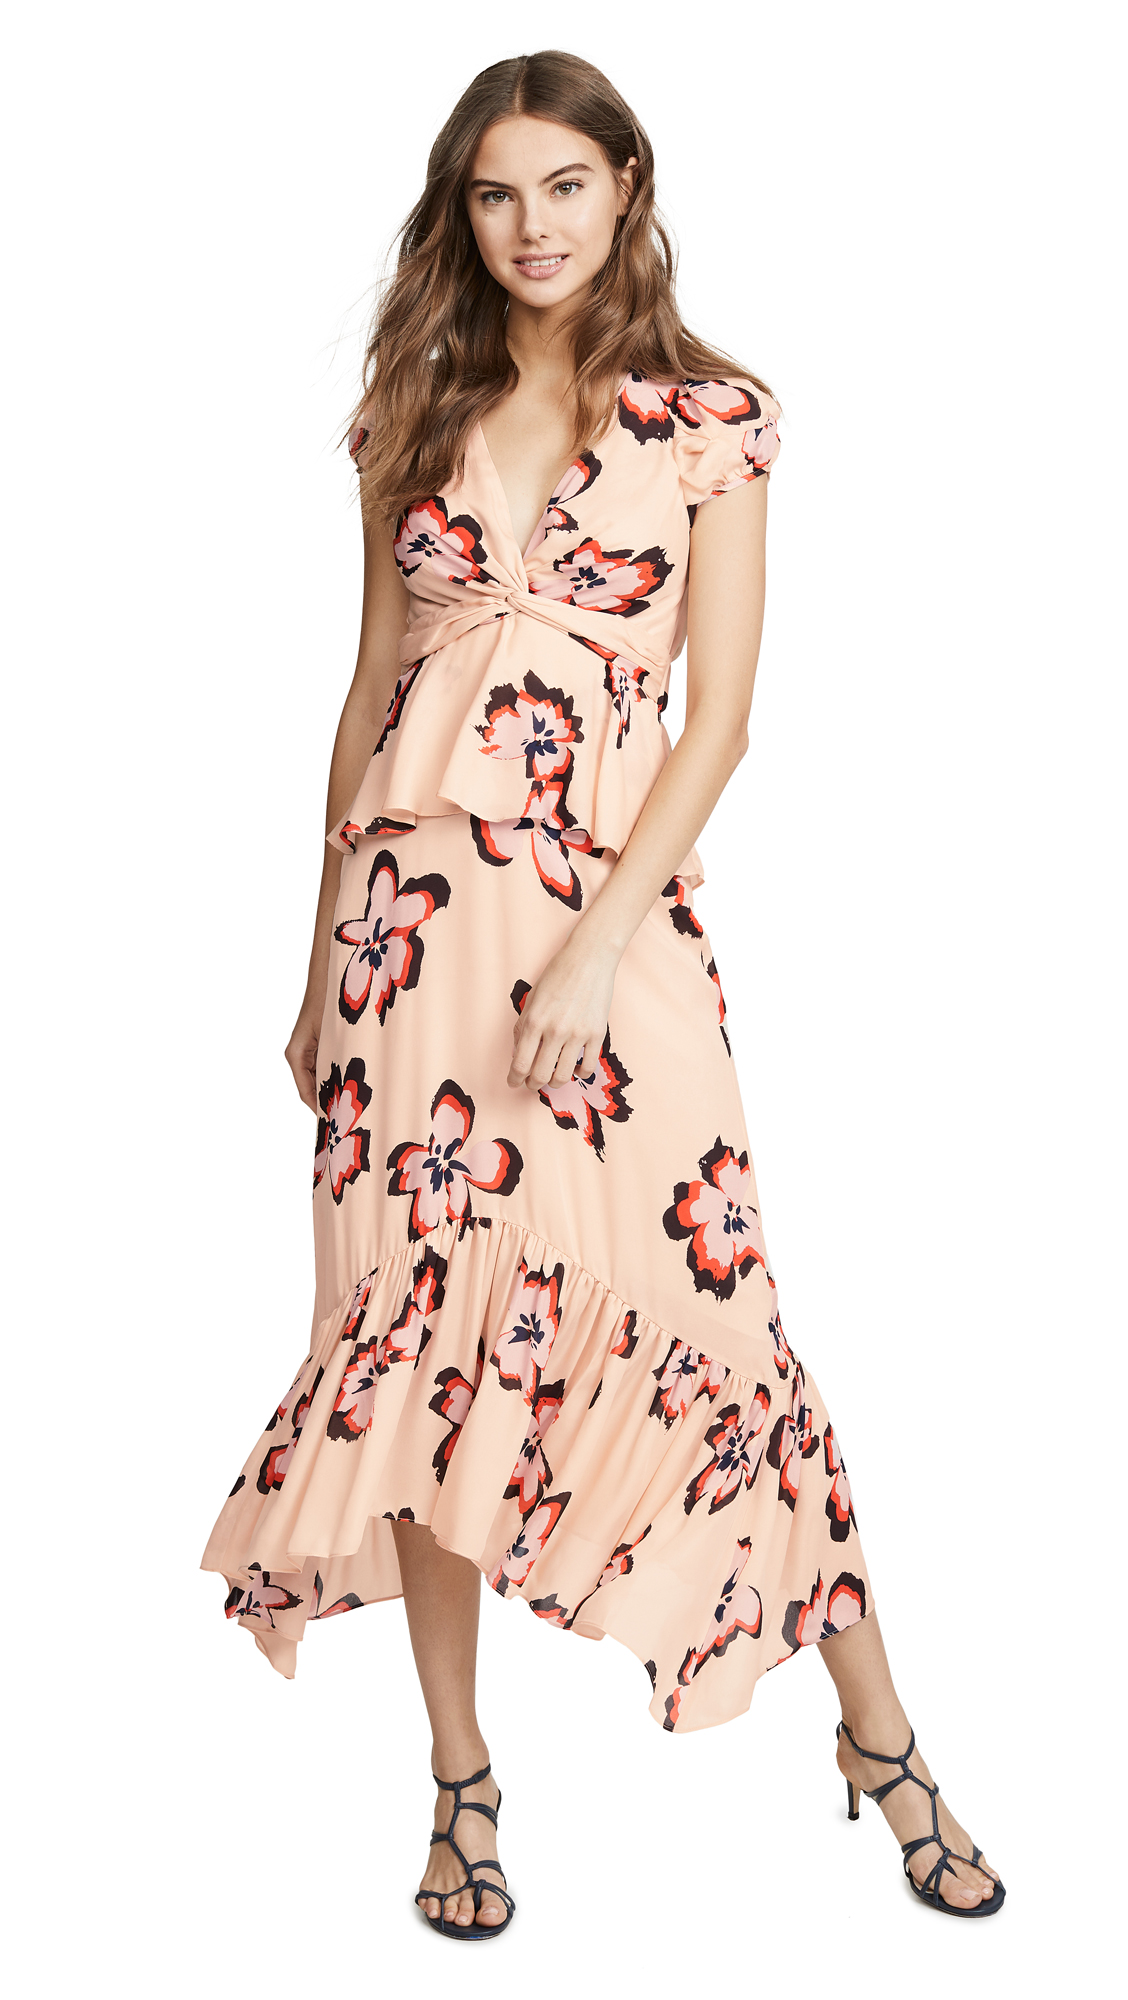 A.L.C. Zadie Dress - Blush/Pink Flower